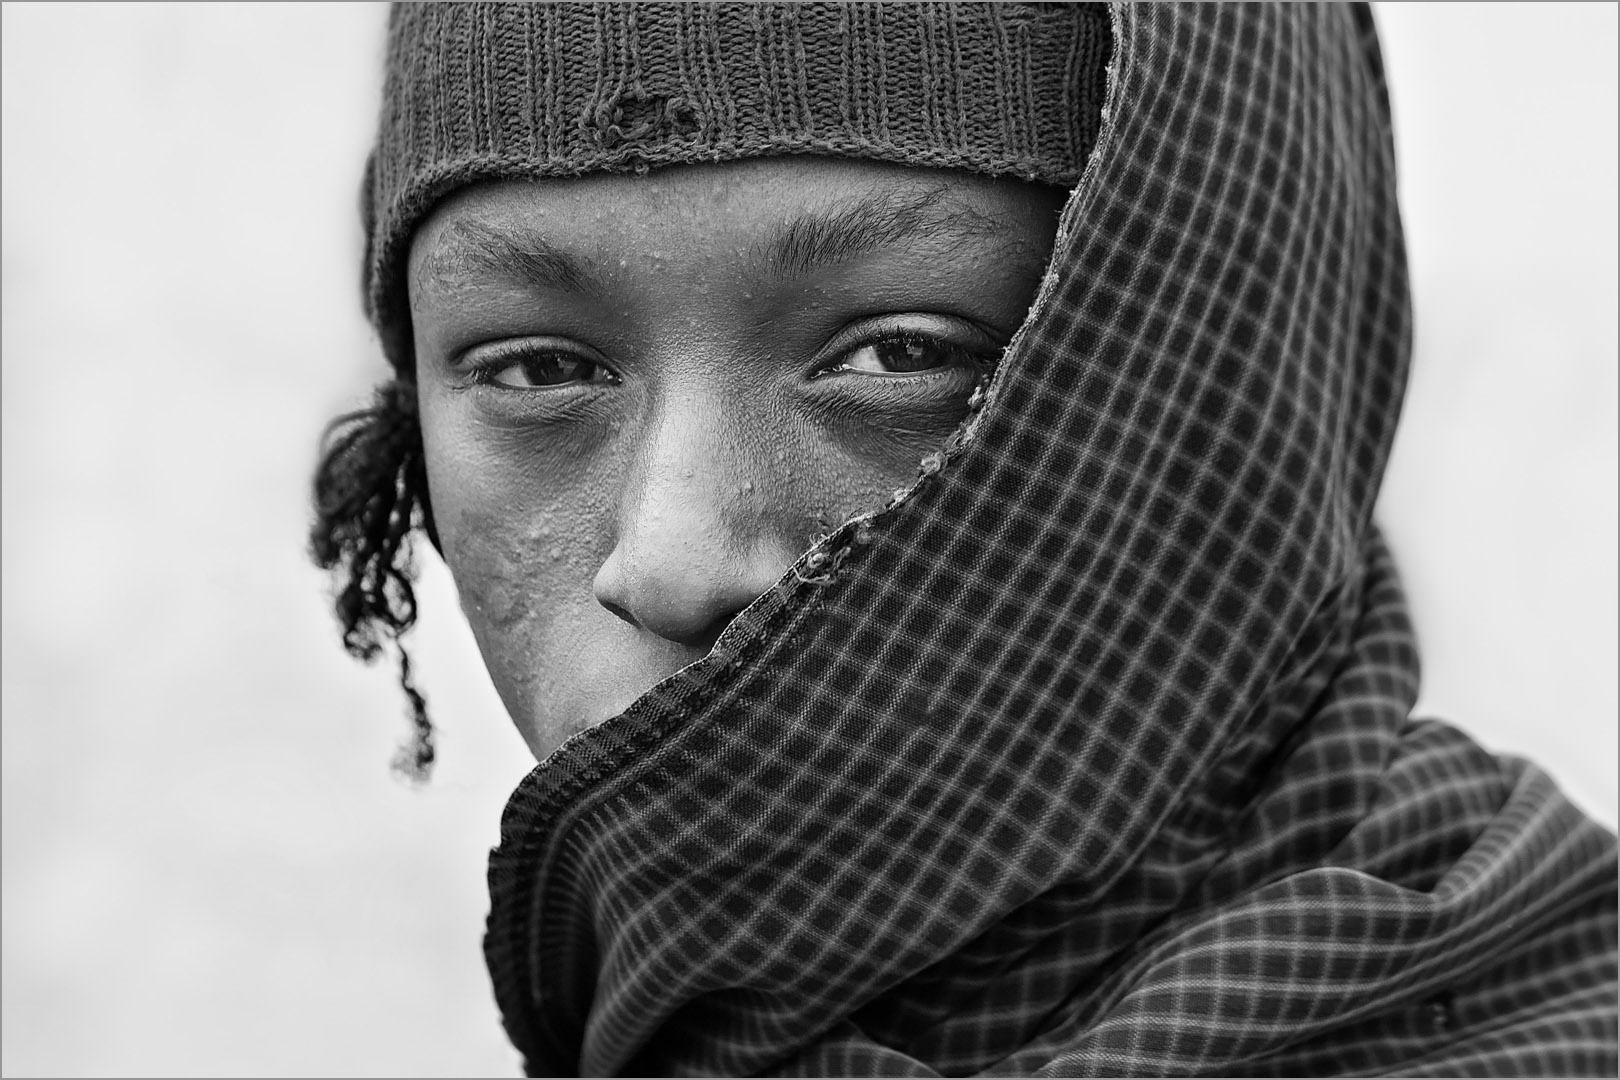 Young Masai Warrior